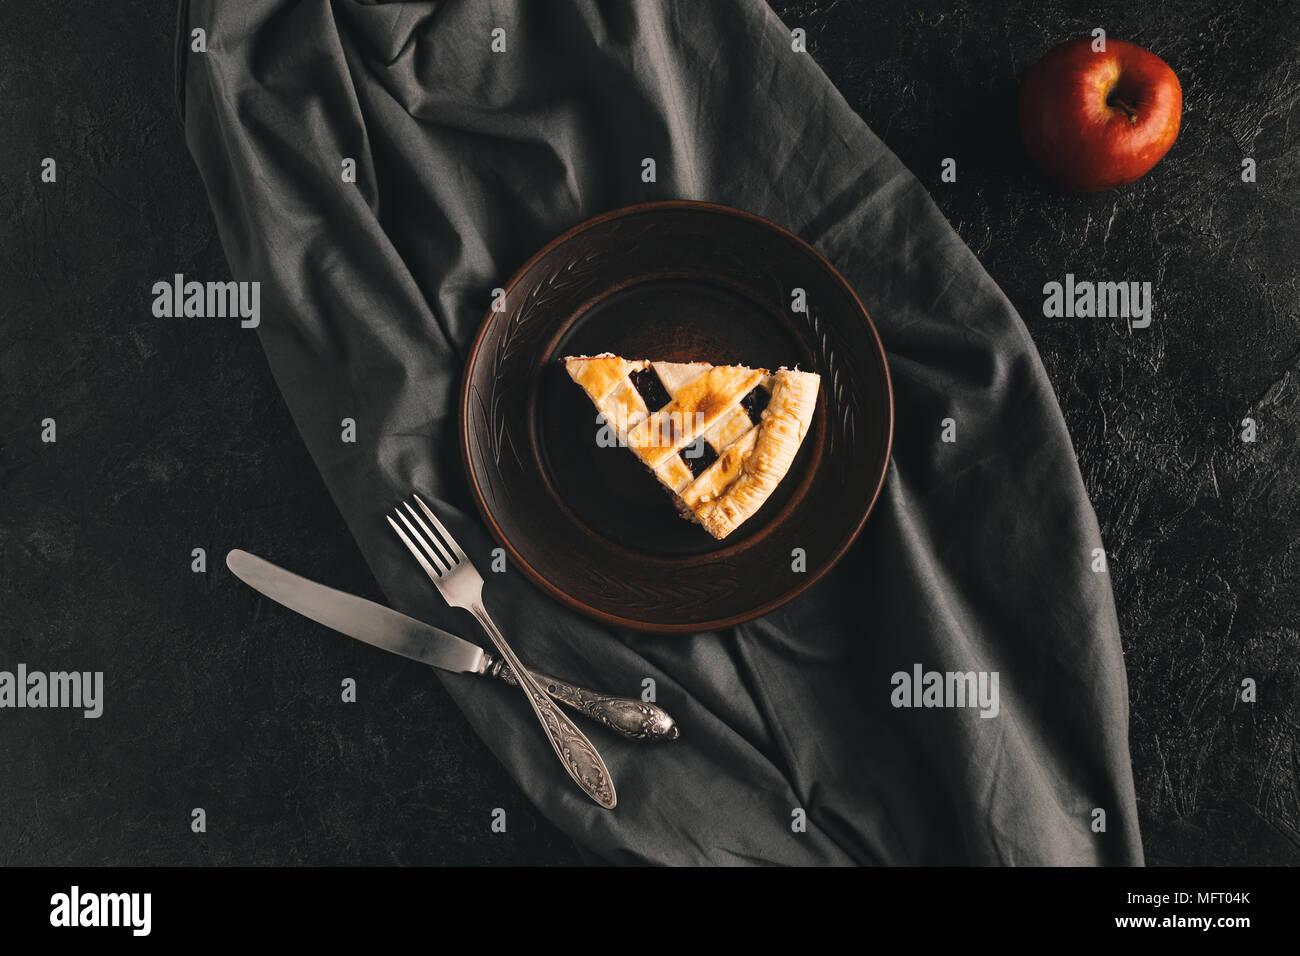 piece of apple pie - Stock Image